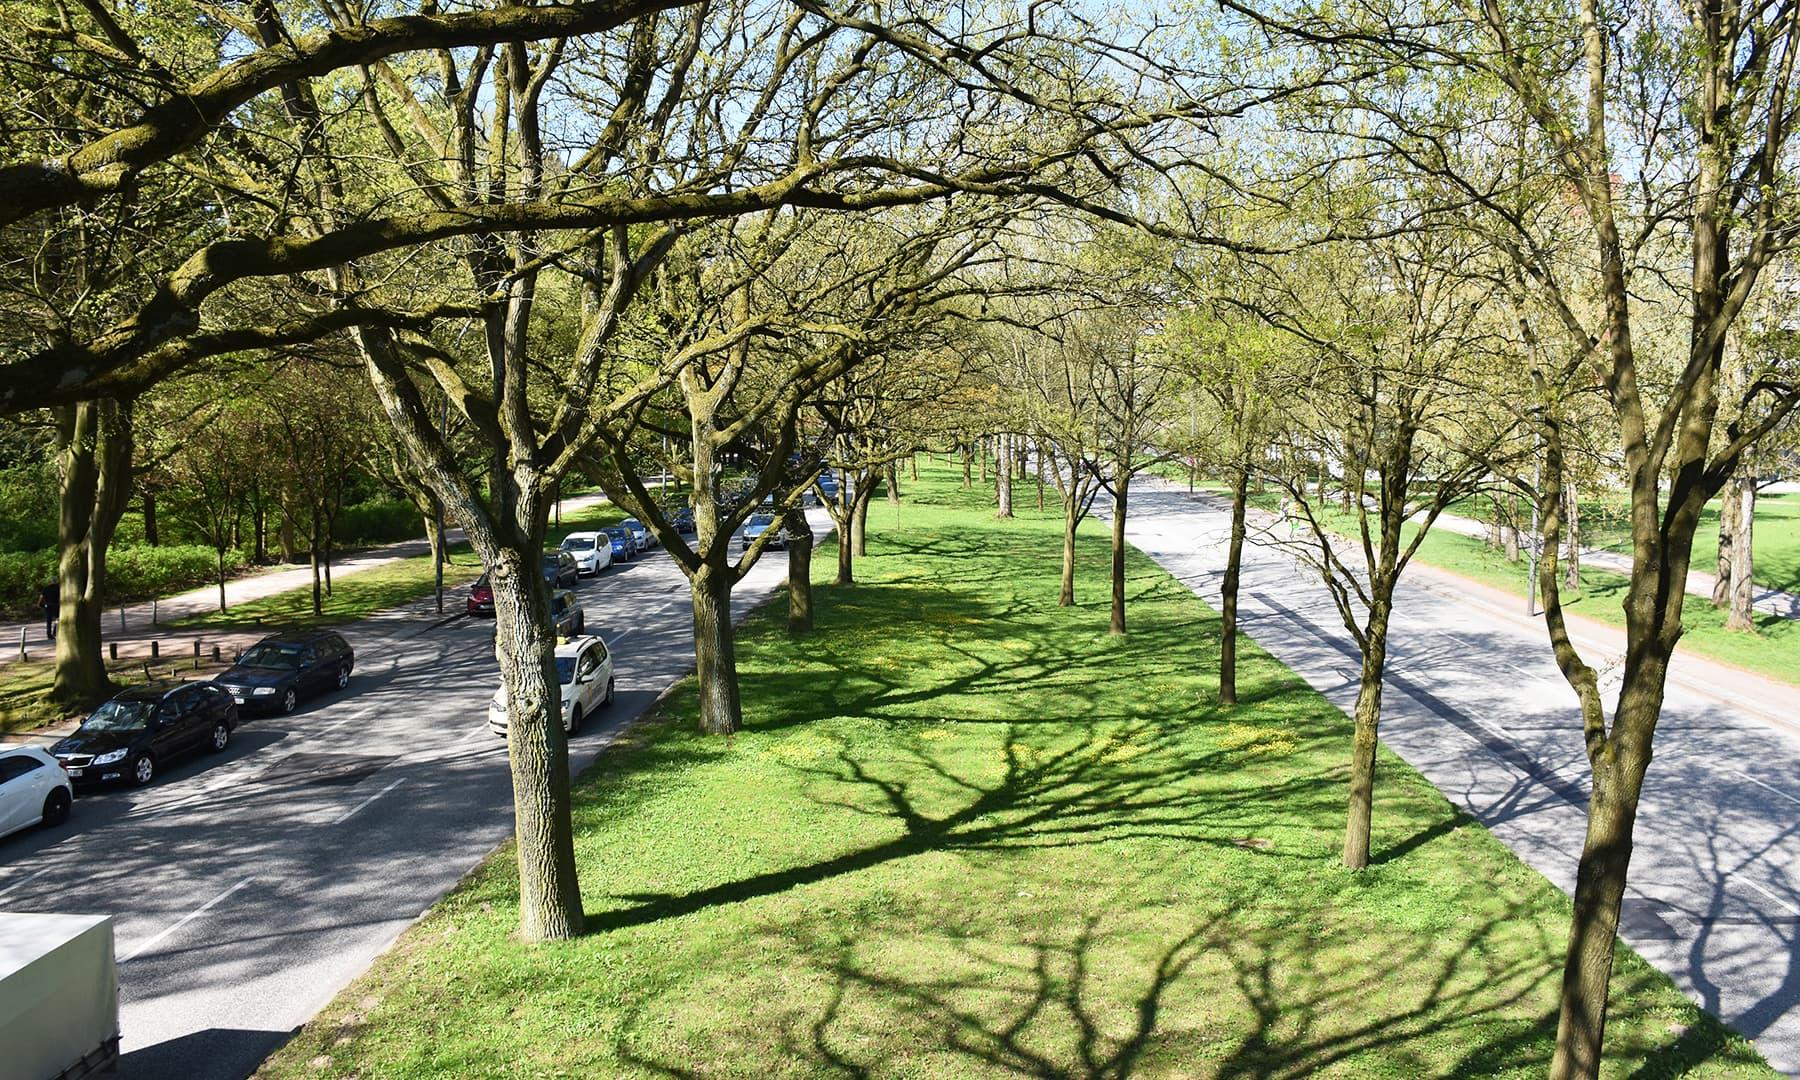 پارک کو جاتی سڑک کے درمیان موجود گرین بیلٹ—تصویر رمضان رفیق